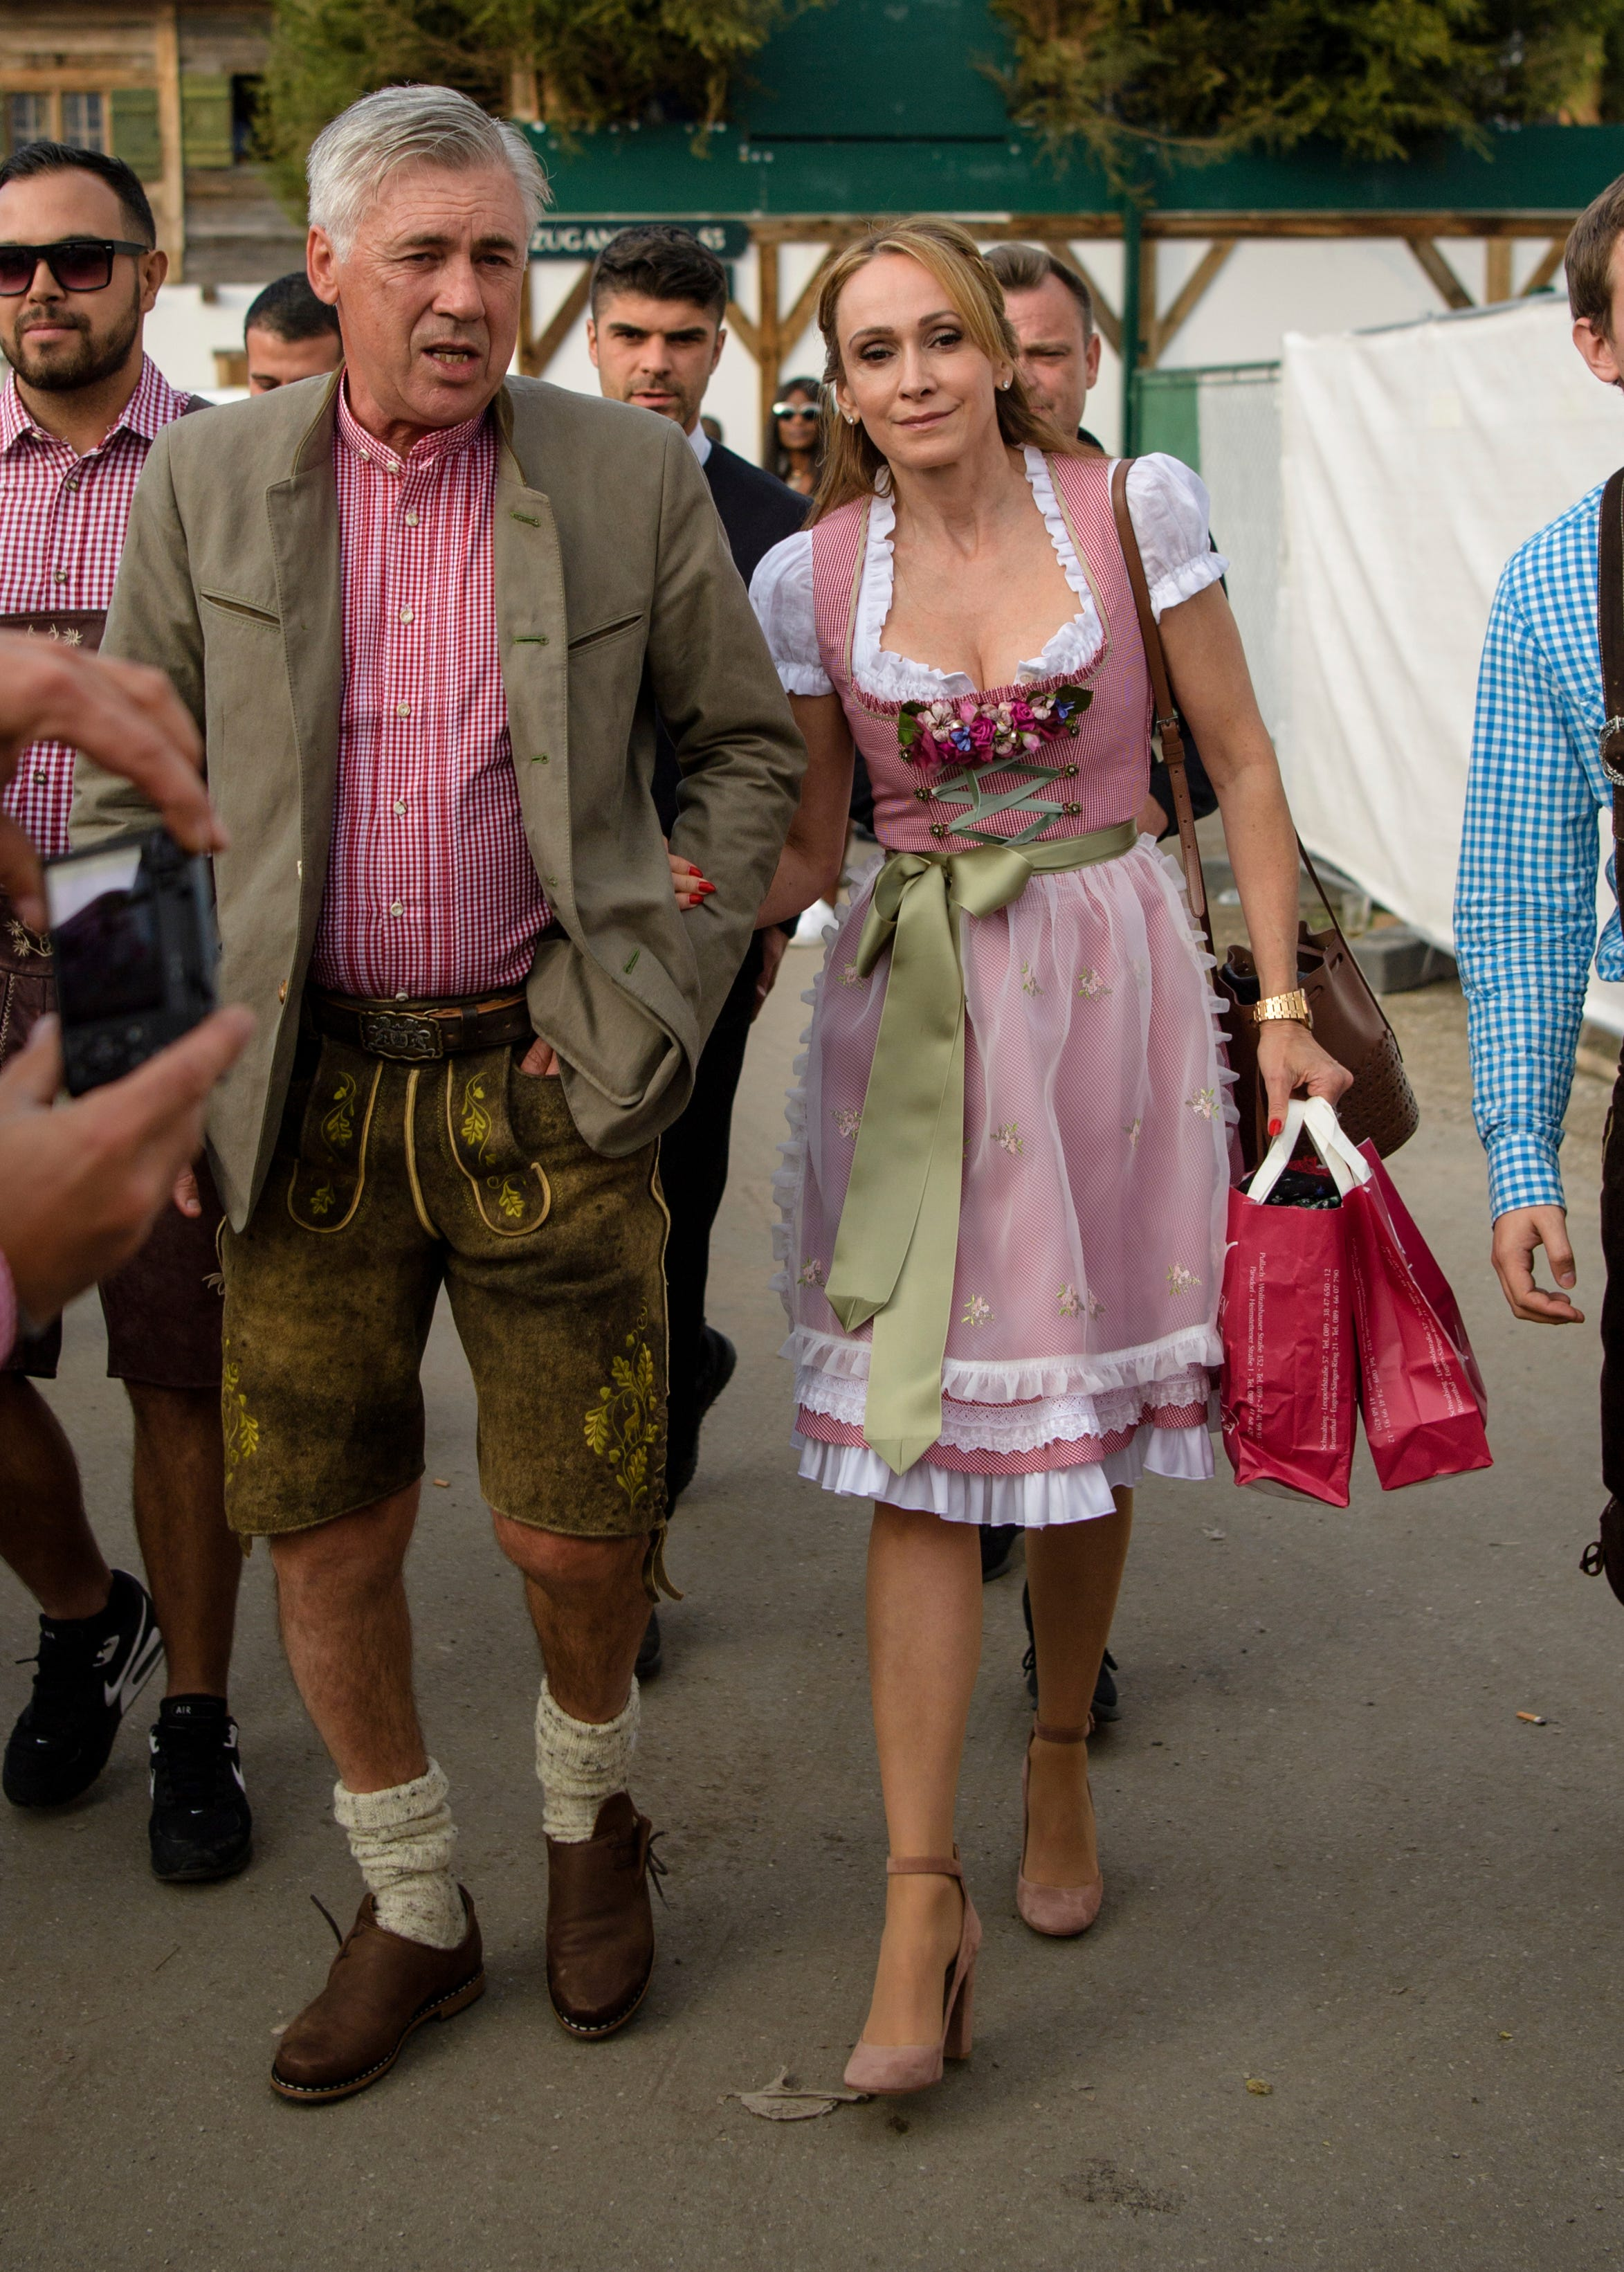 Bayern forgets Bundesliga troubles with beer at Oktoberfest